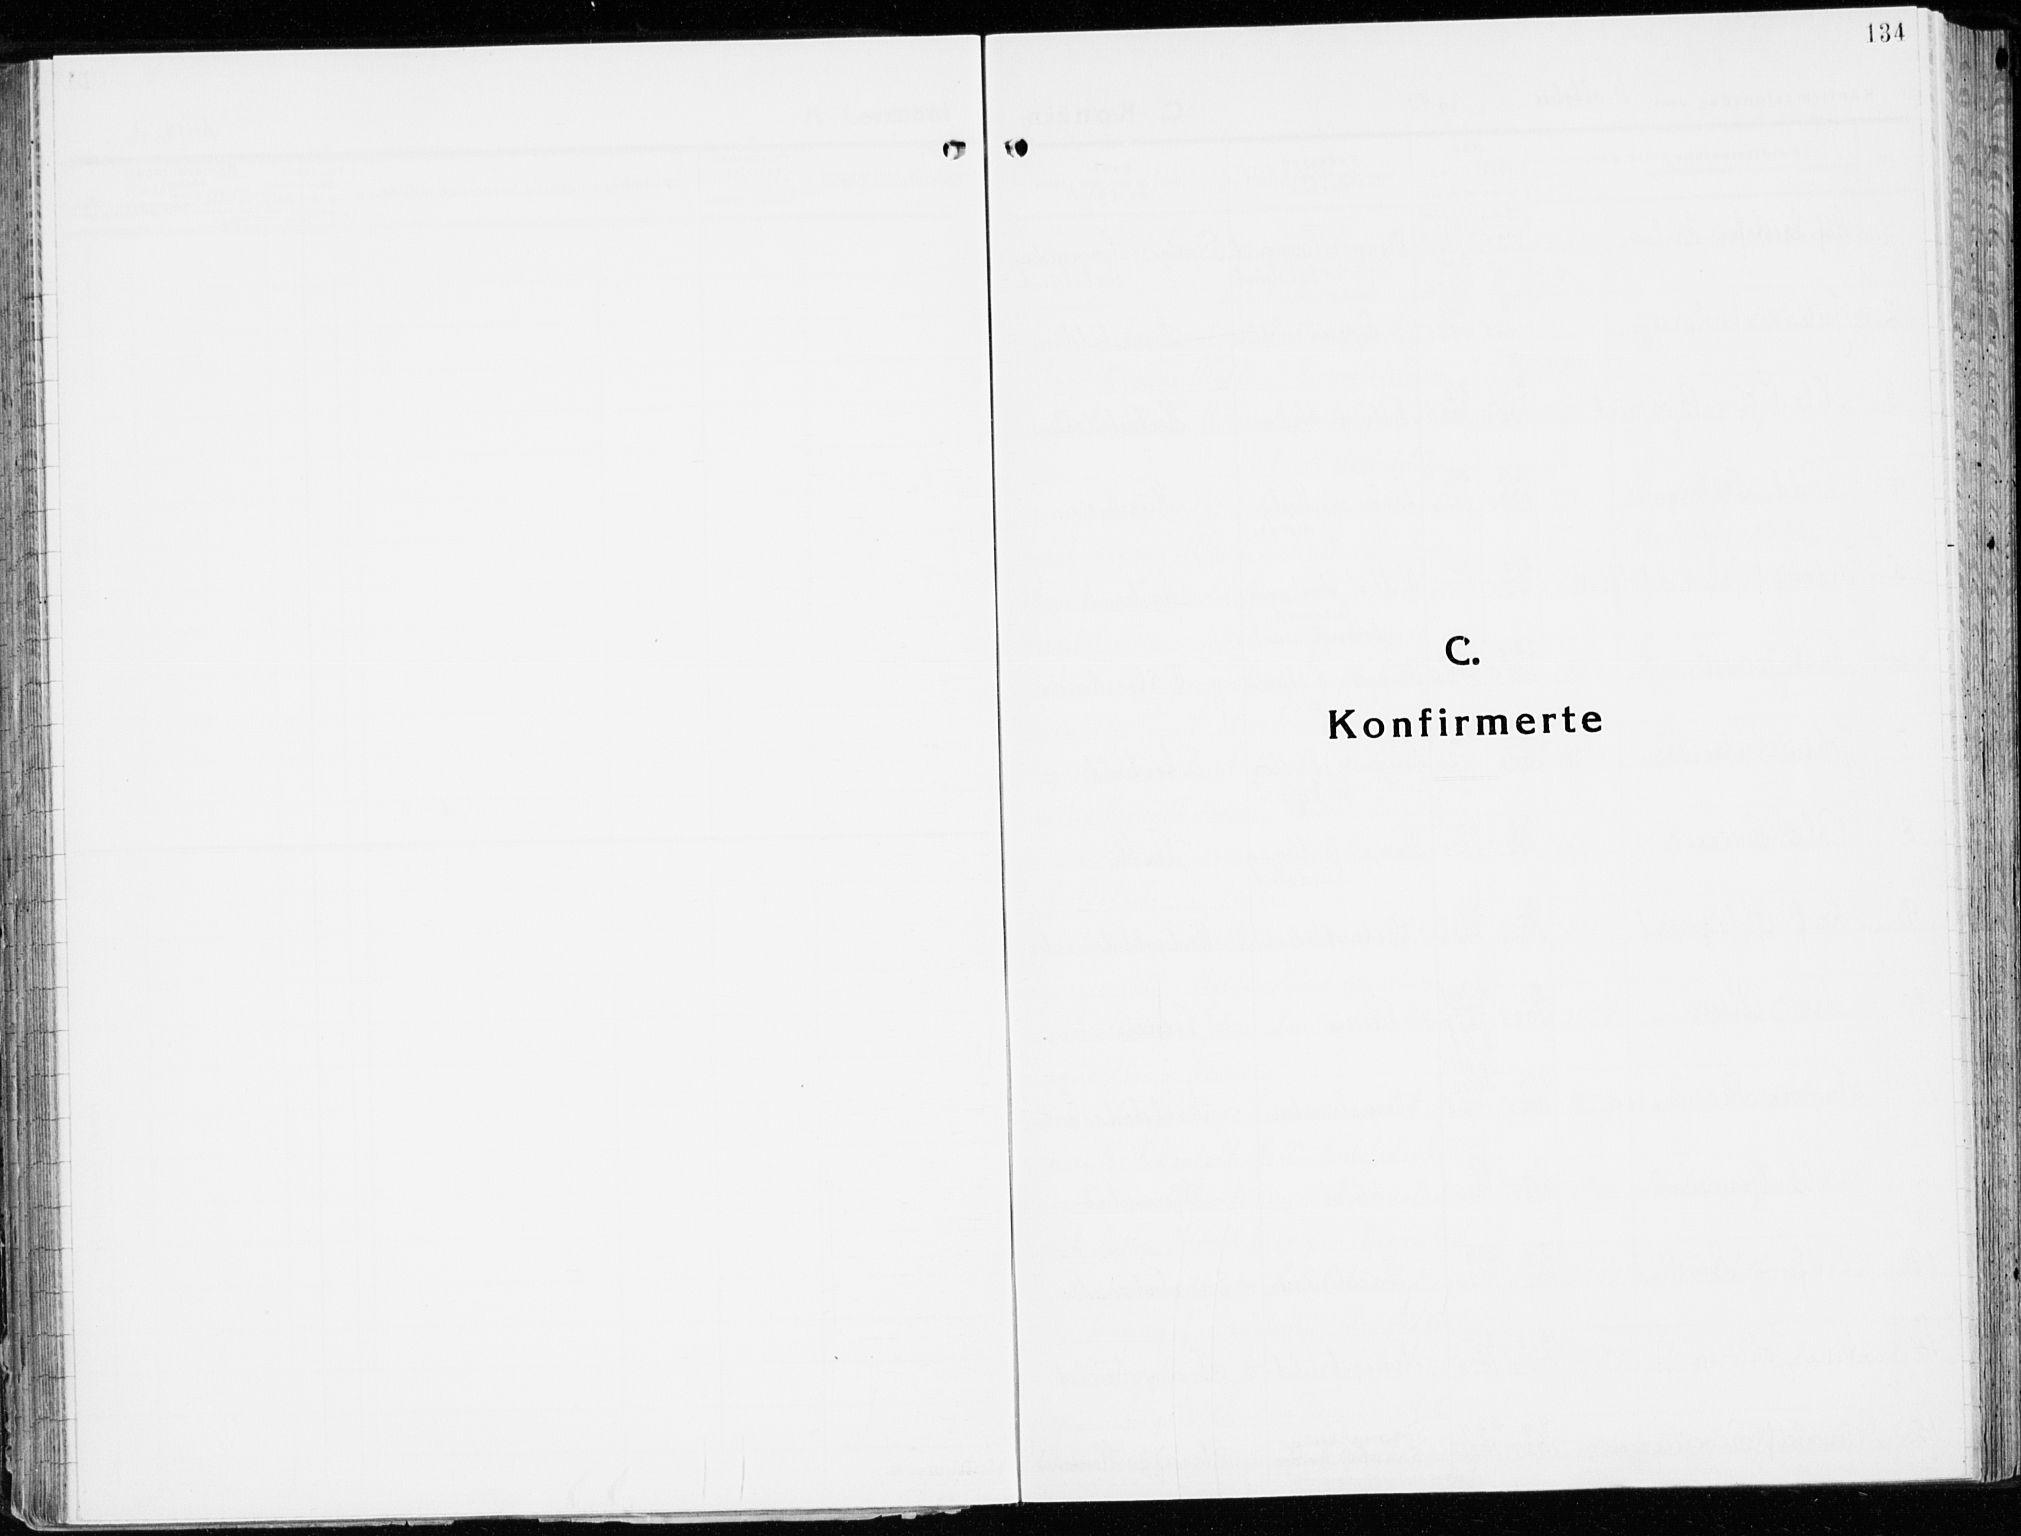 SAH, Stange prestekontor, K/L0027: Ministerialbok nr. 27, 1937-1947, s. 134